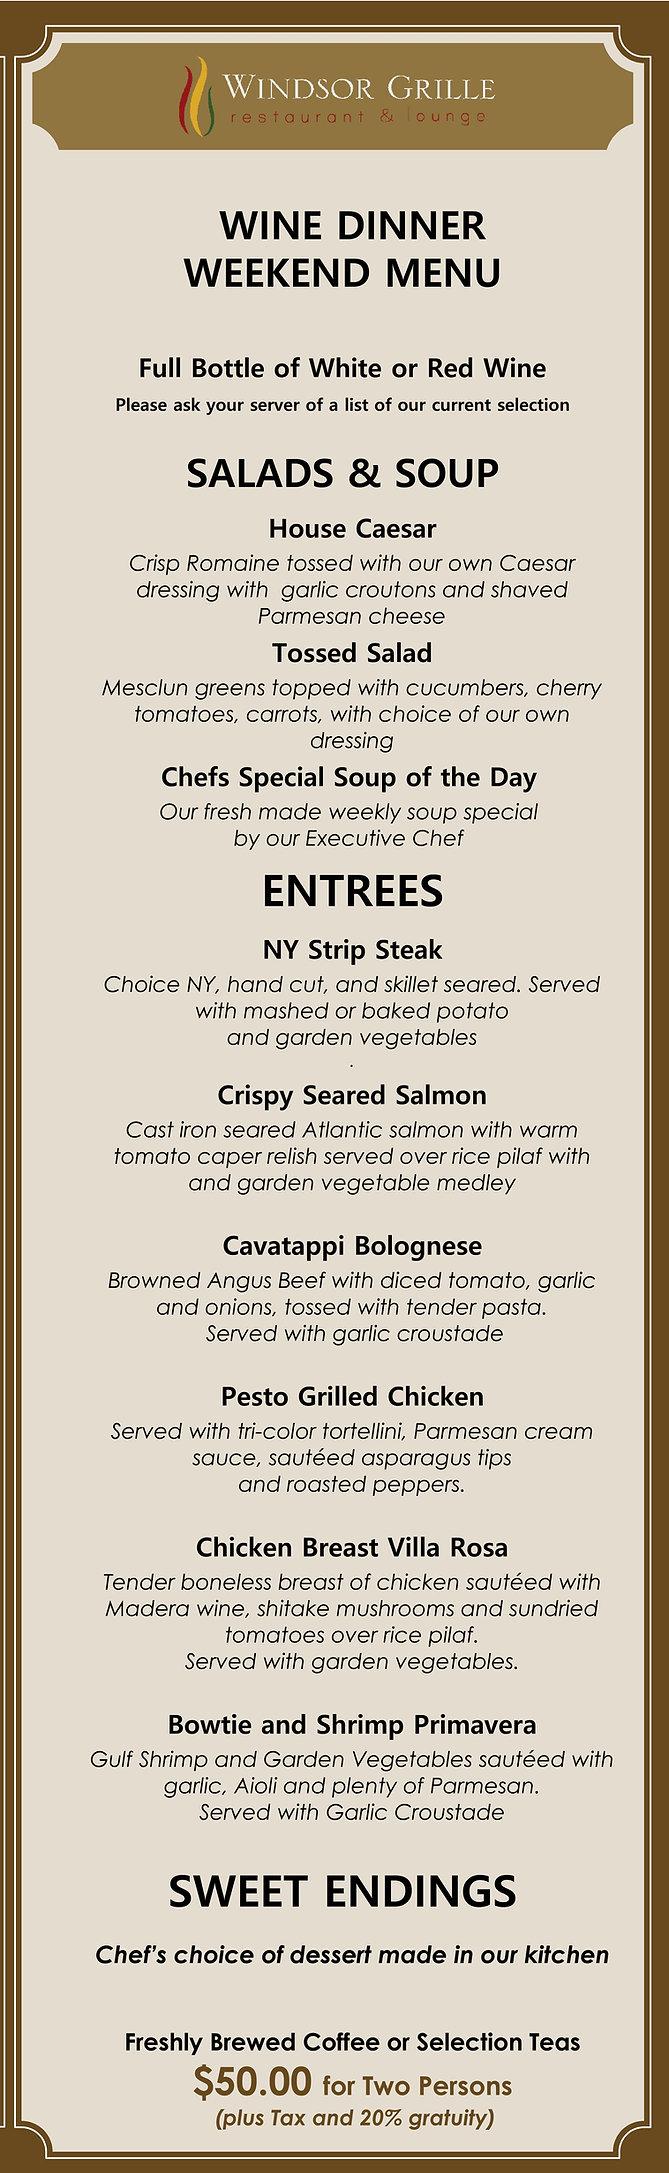 wine dinner menu single sheet_001.jpg